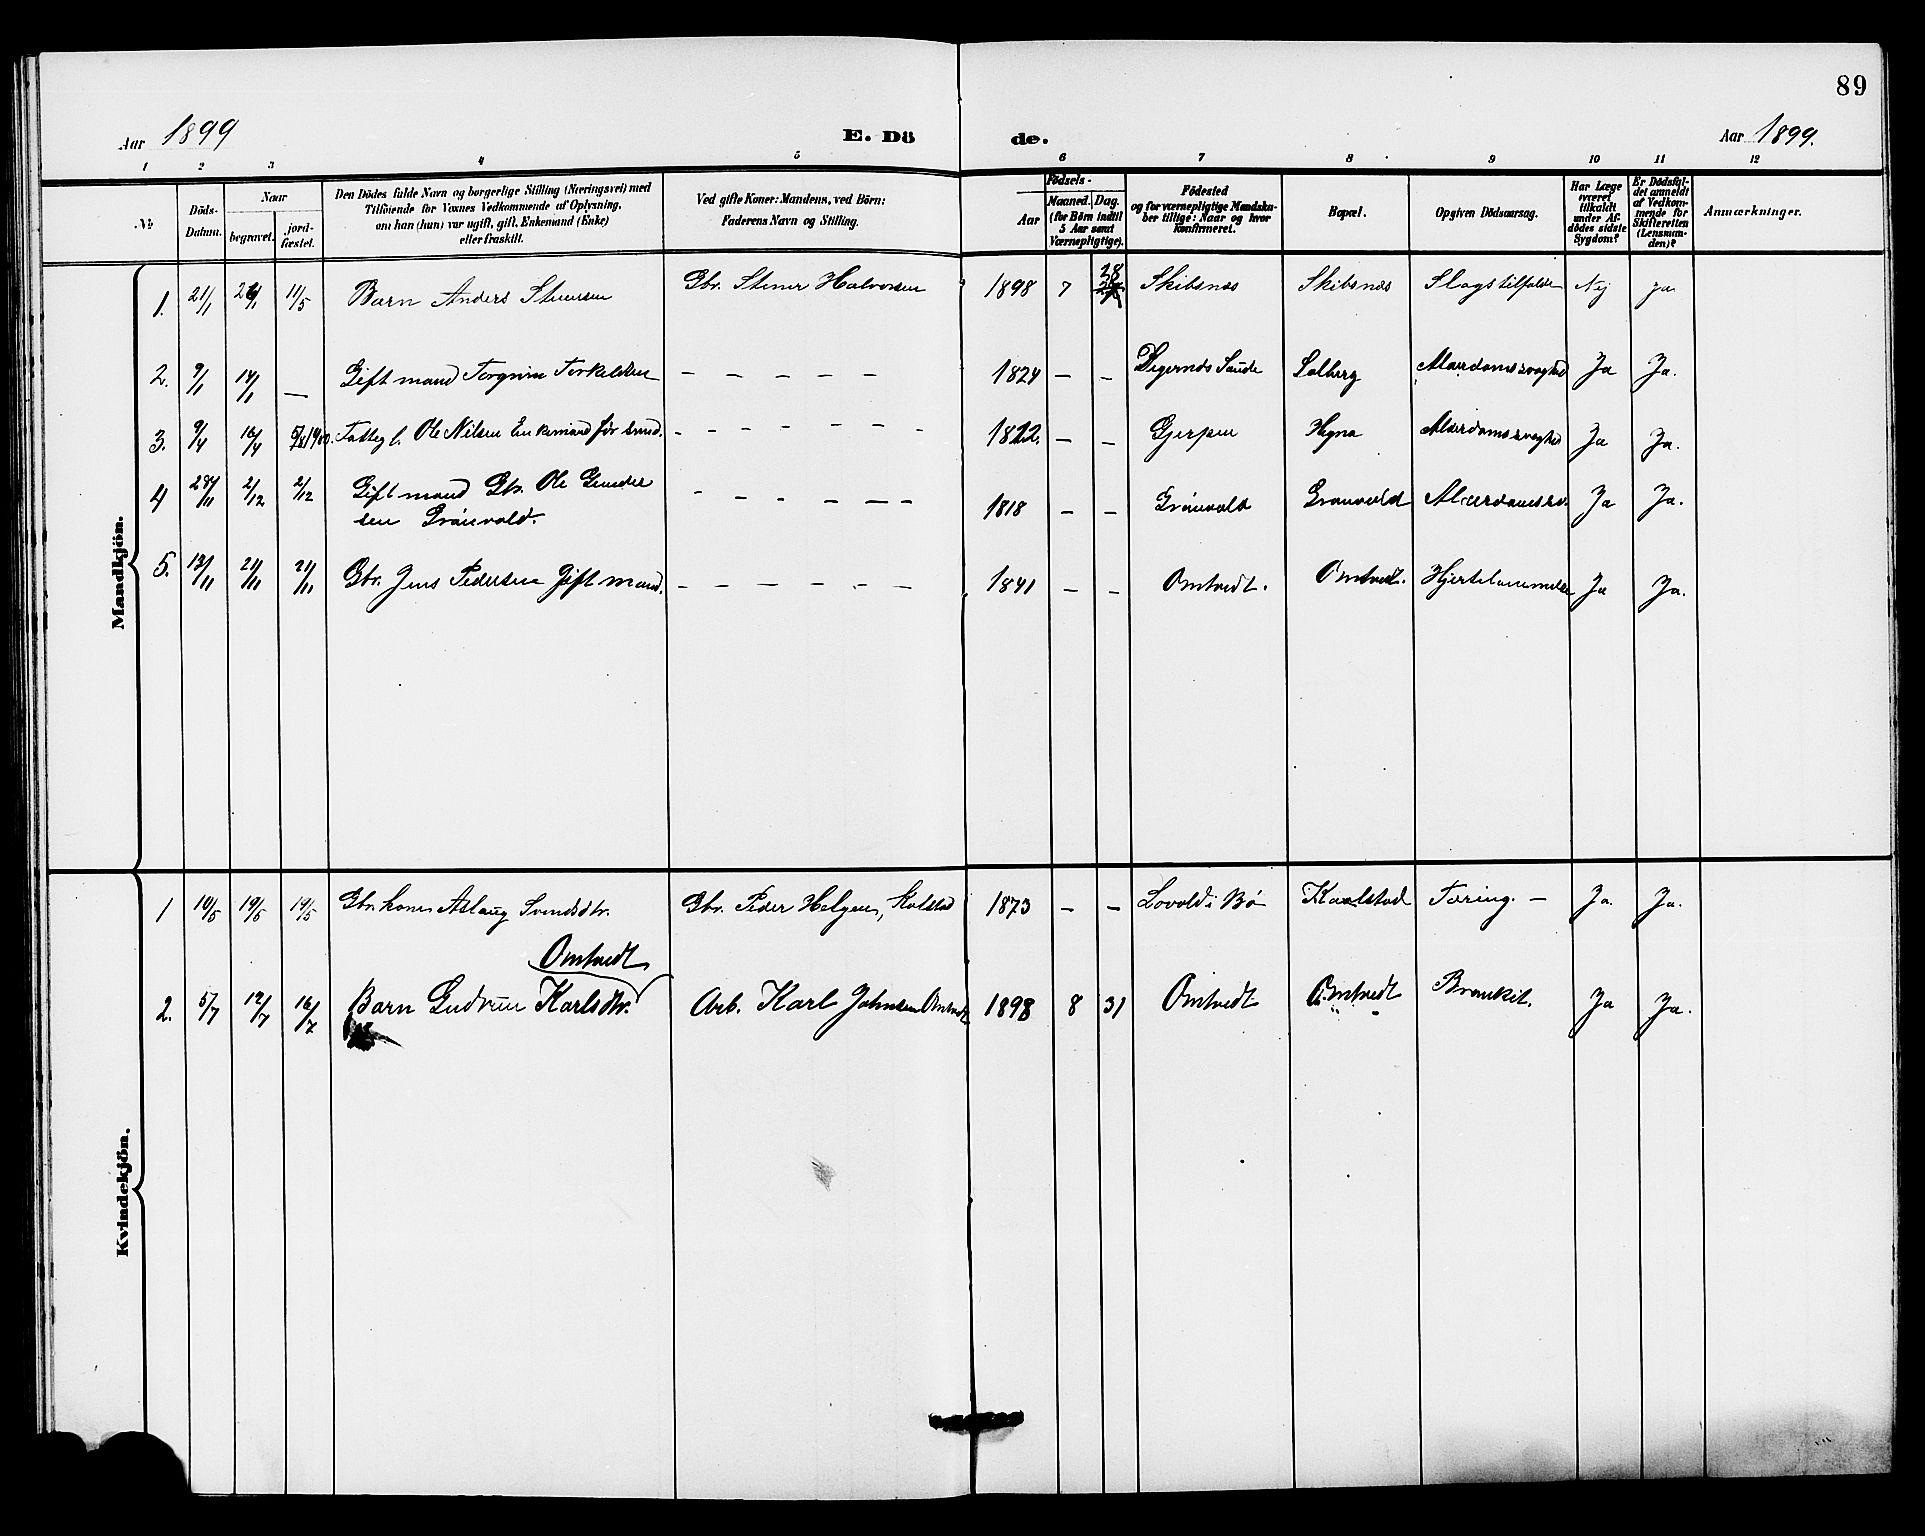 SAKO, Holla kirkebøker, G/Gb/L0002: Klokkerbok nr. II 2, 1897-1913, s. 89